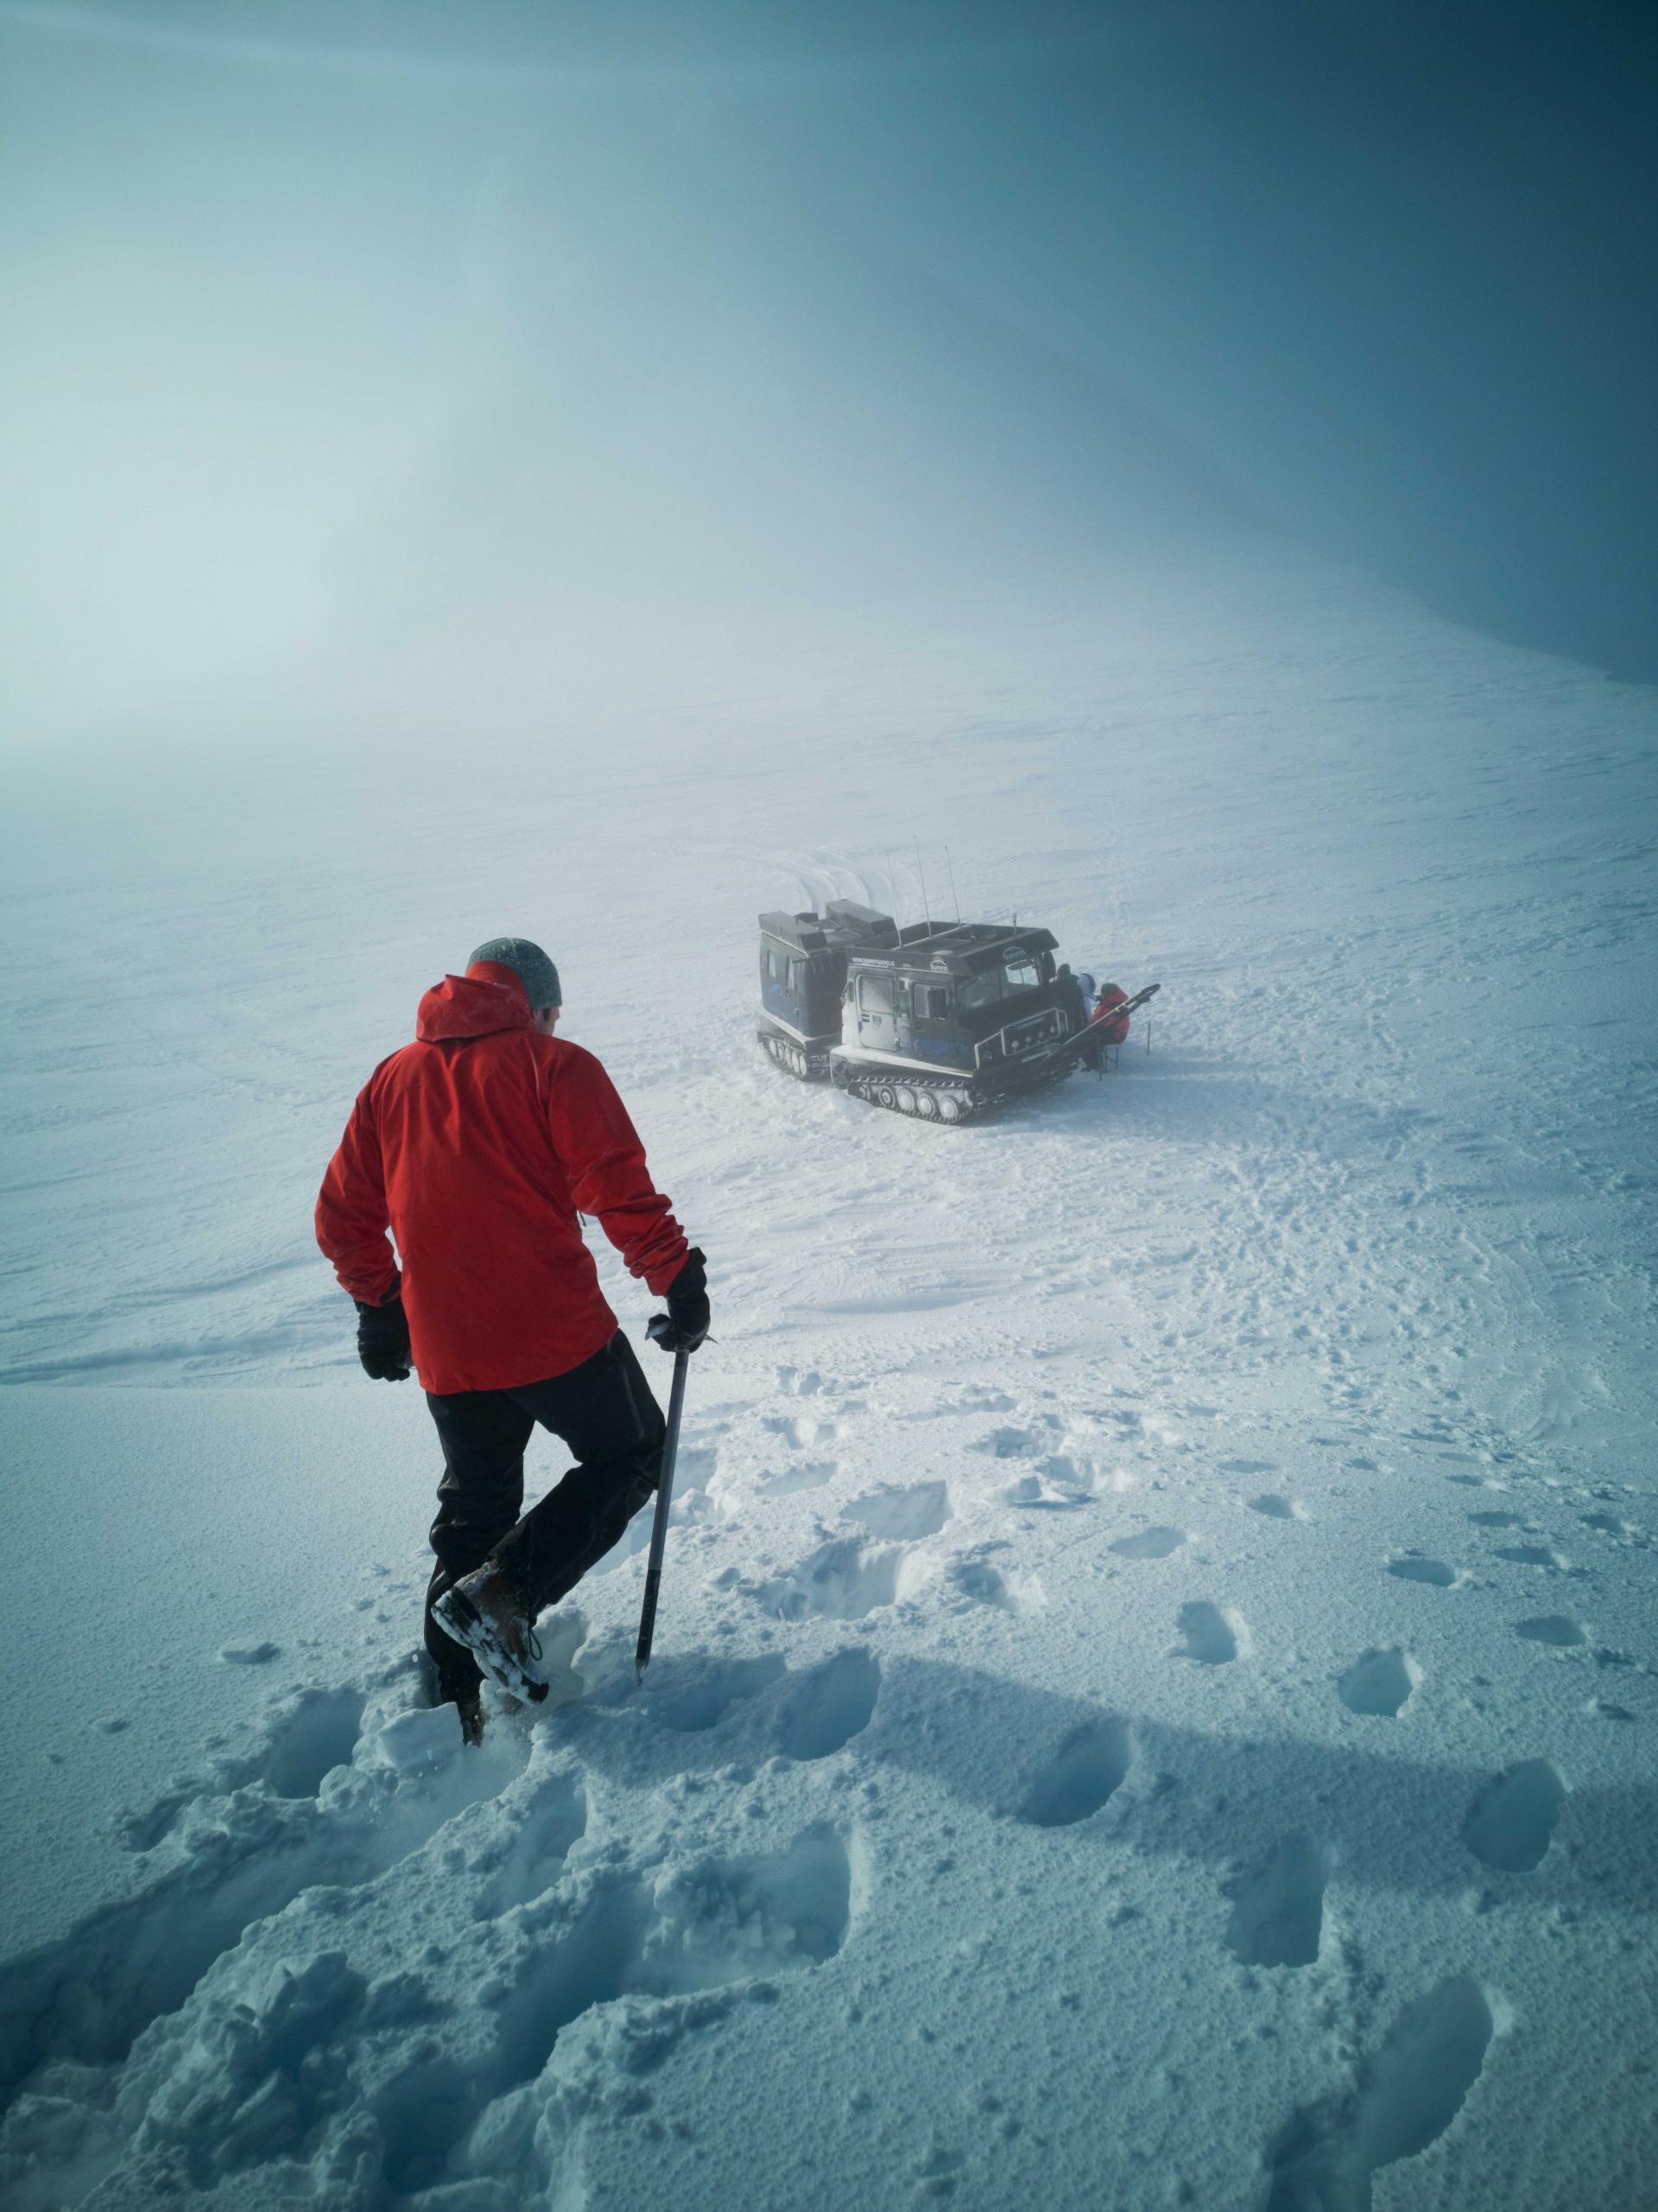 Snaefellsnes, west Iceland: Snaefellsjokull glacier